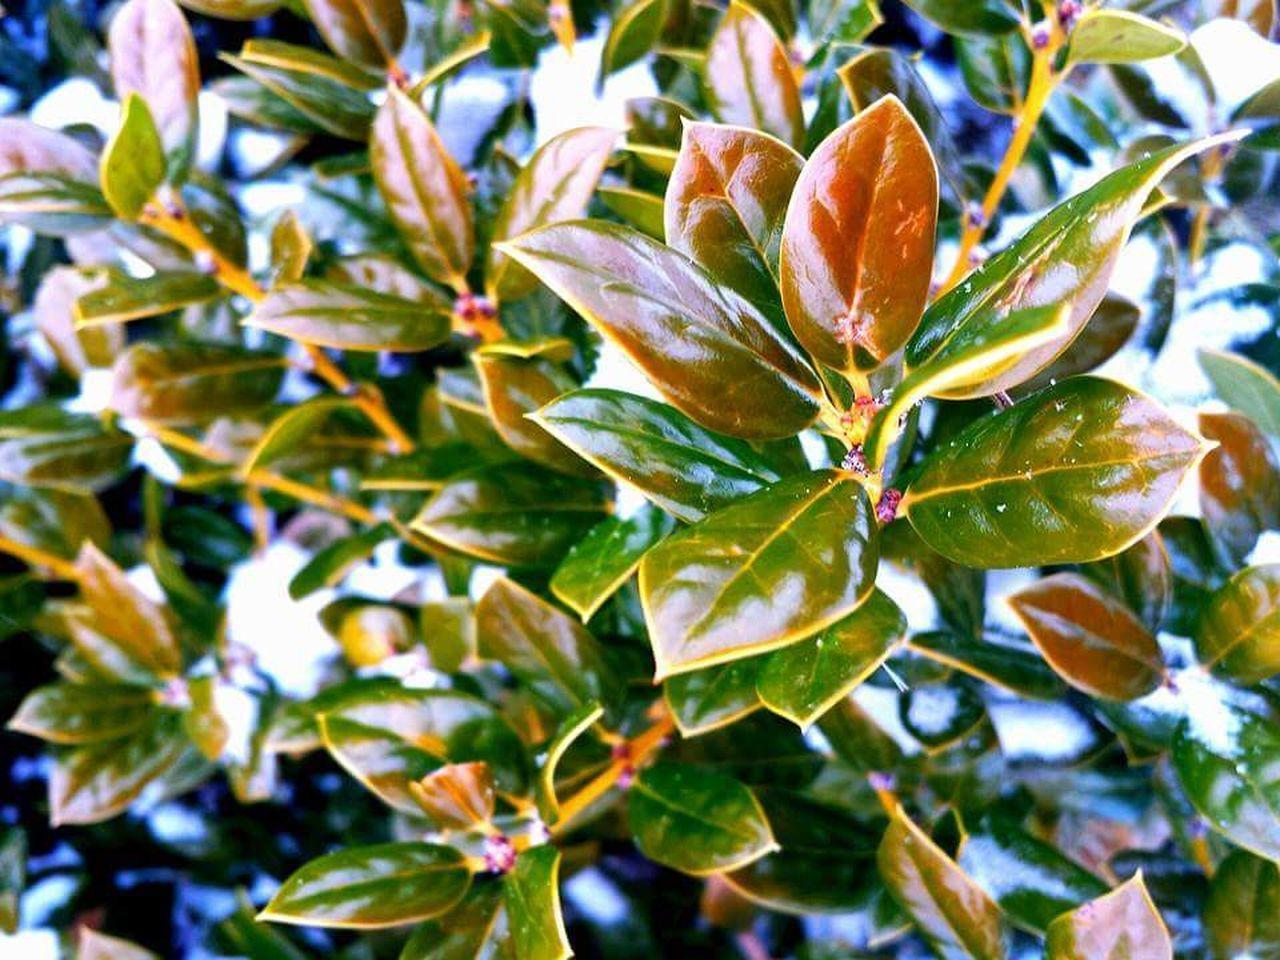 Plants And Flowers Bushes Nature Snow Smithsburg Maryland Maryland